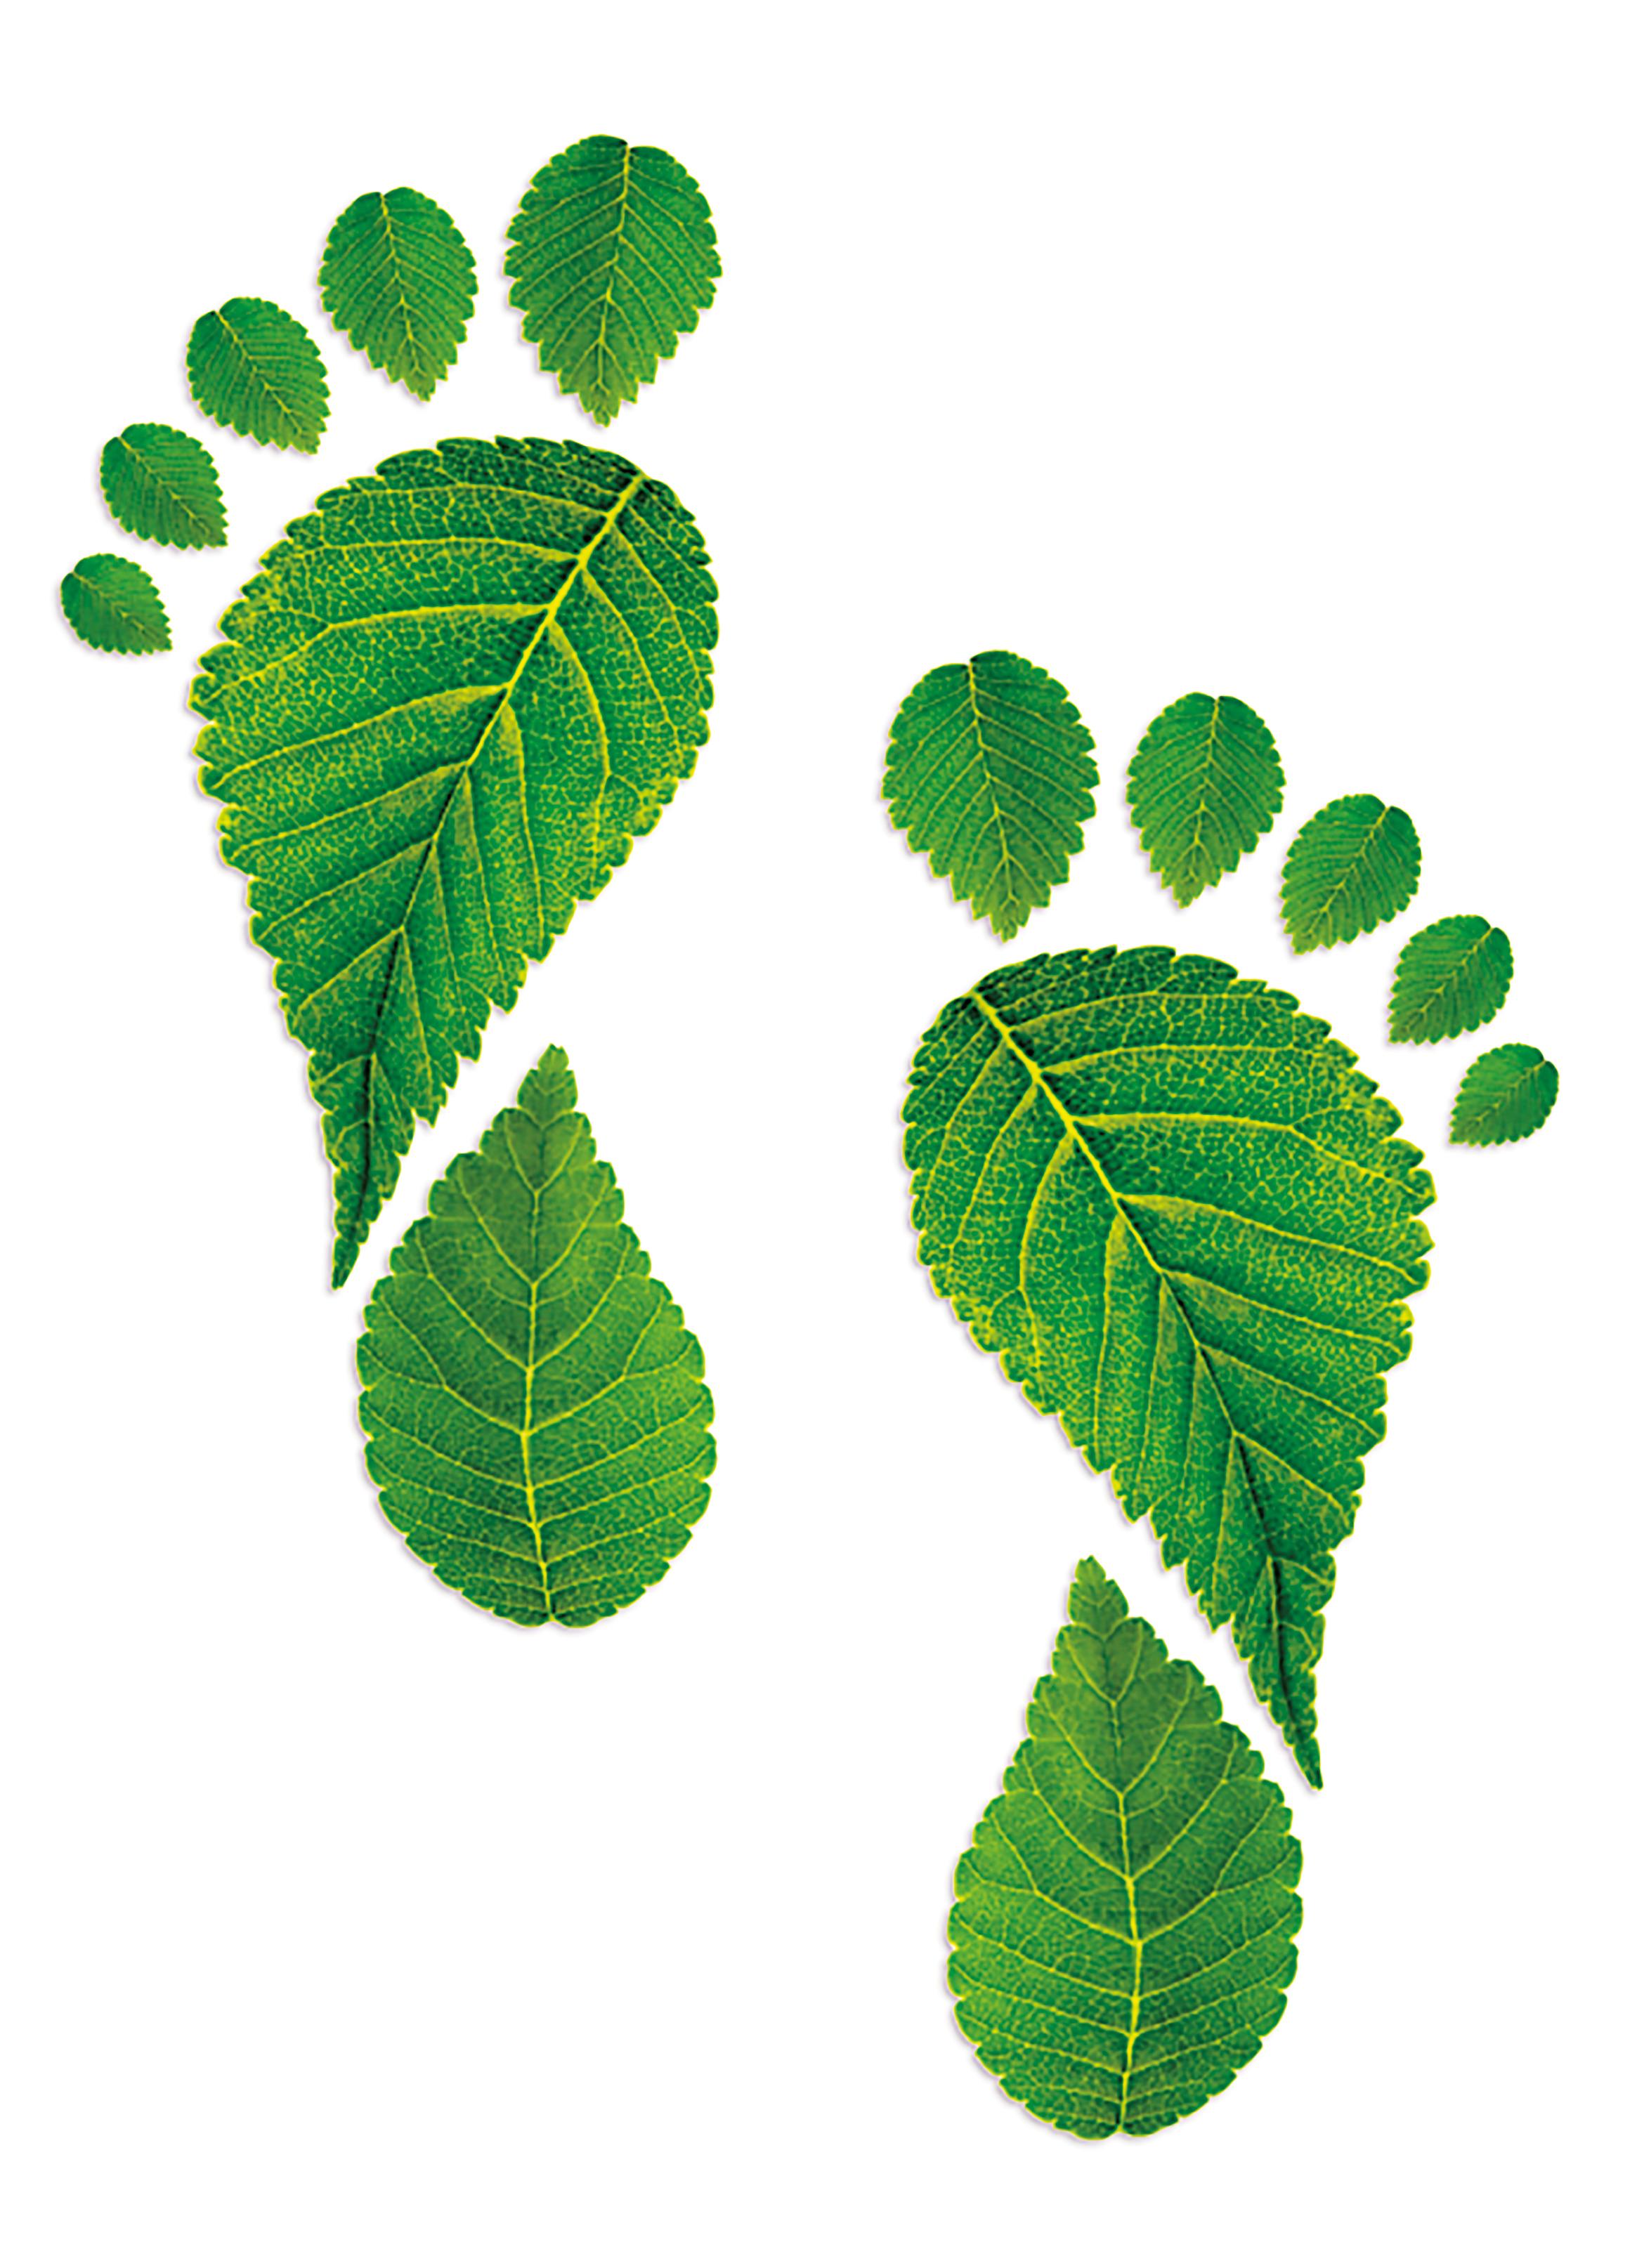 footprint000059504978_Small.jpg